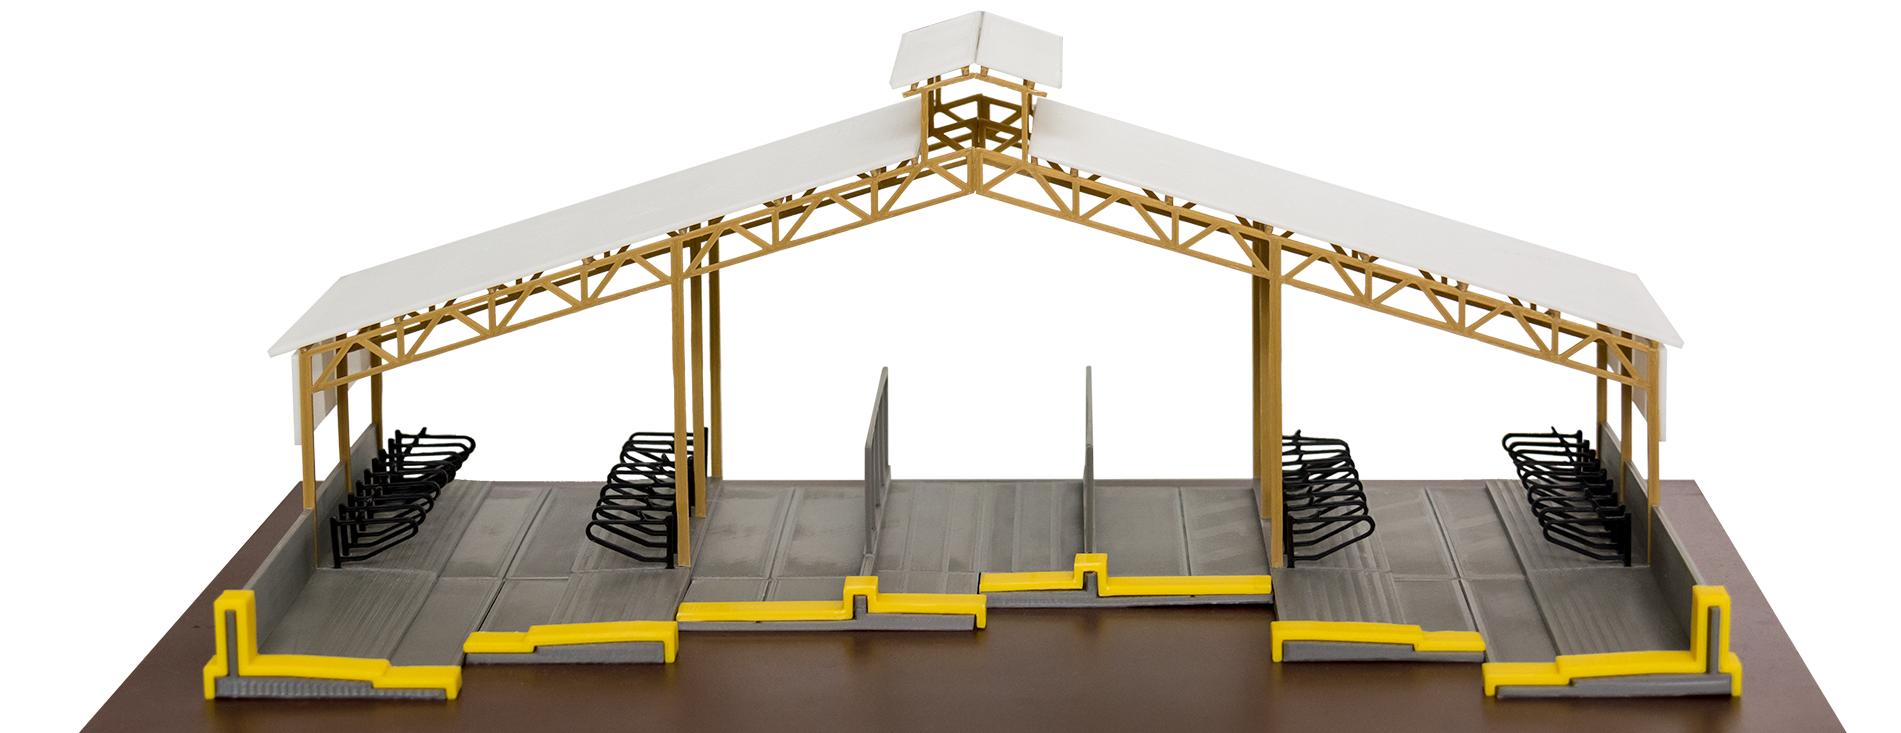 3D-макет коровника